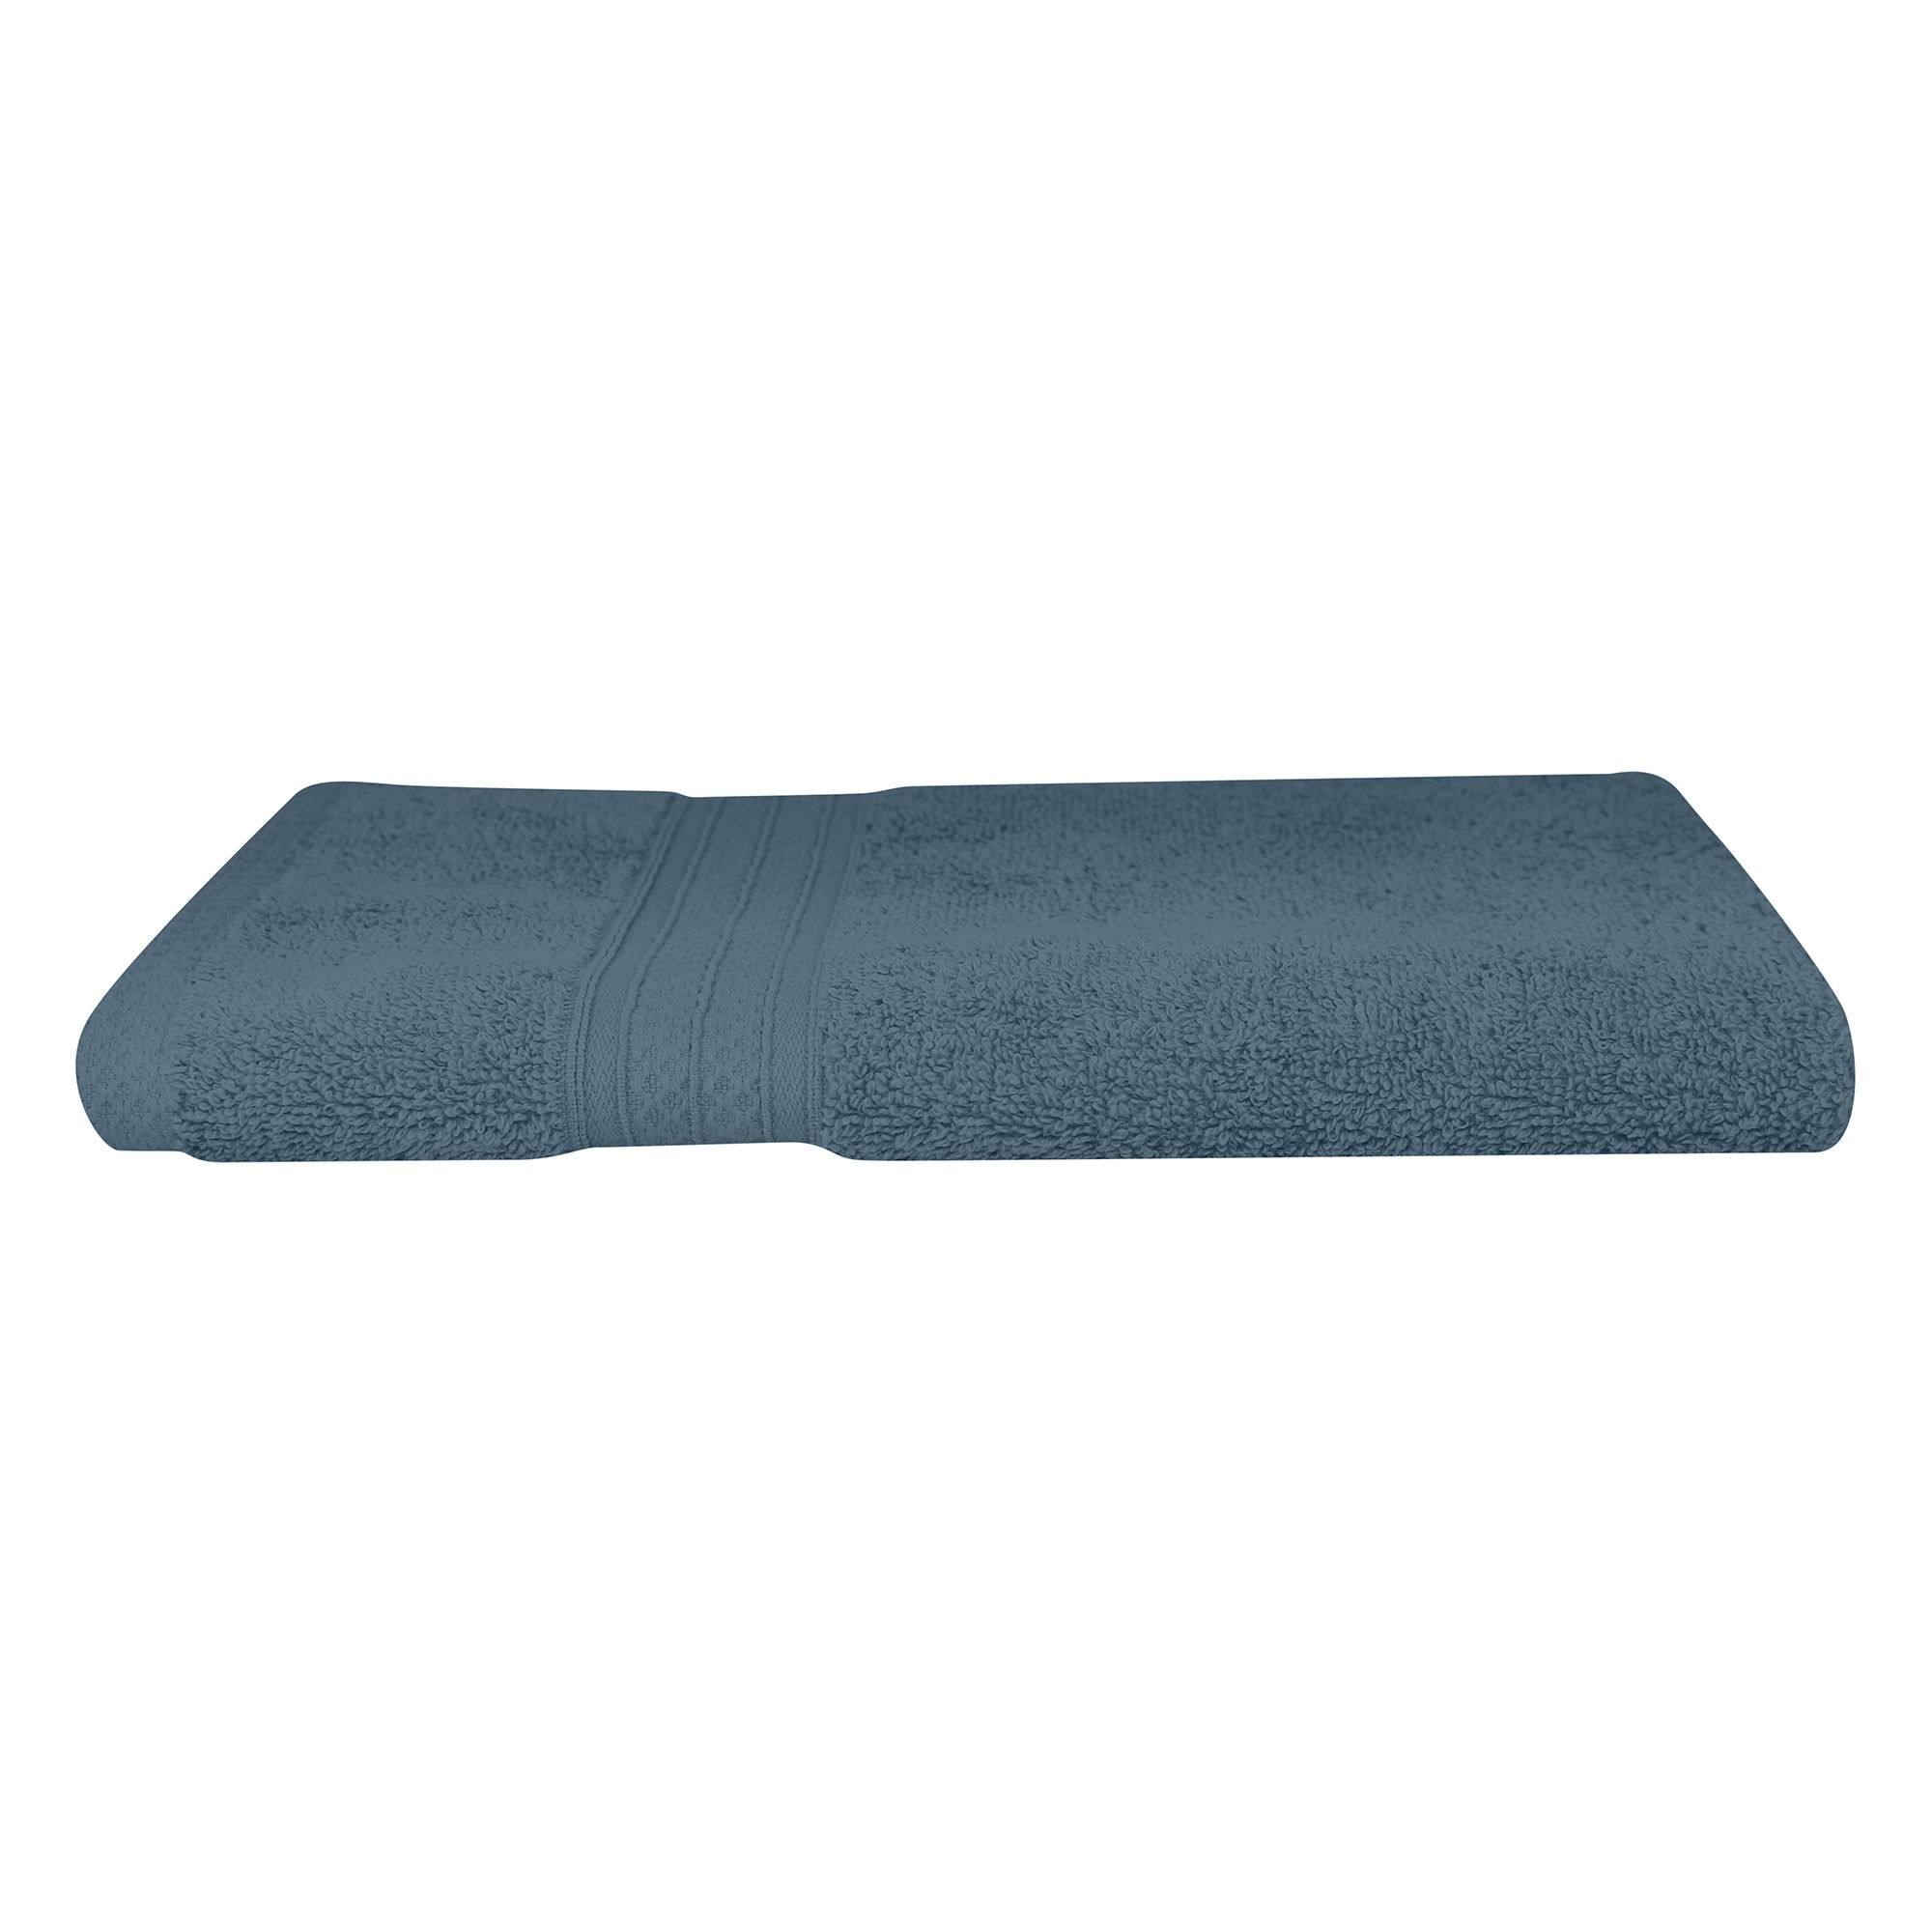 Odyssey Living Meridian Cotton Hand Towel, Denim